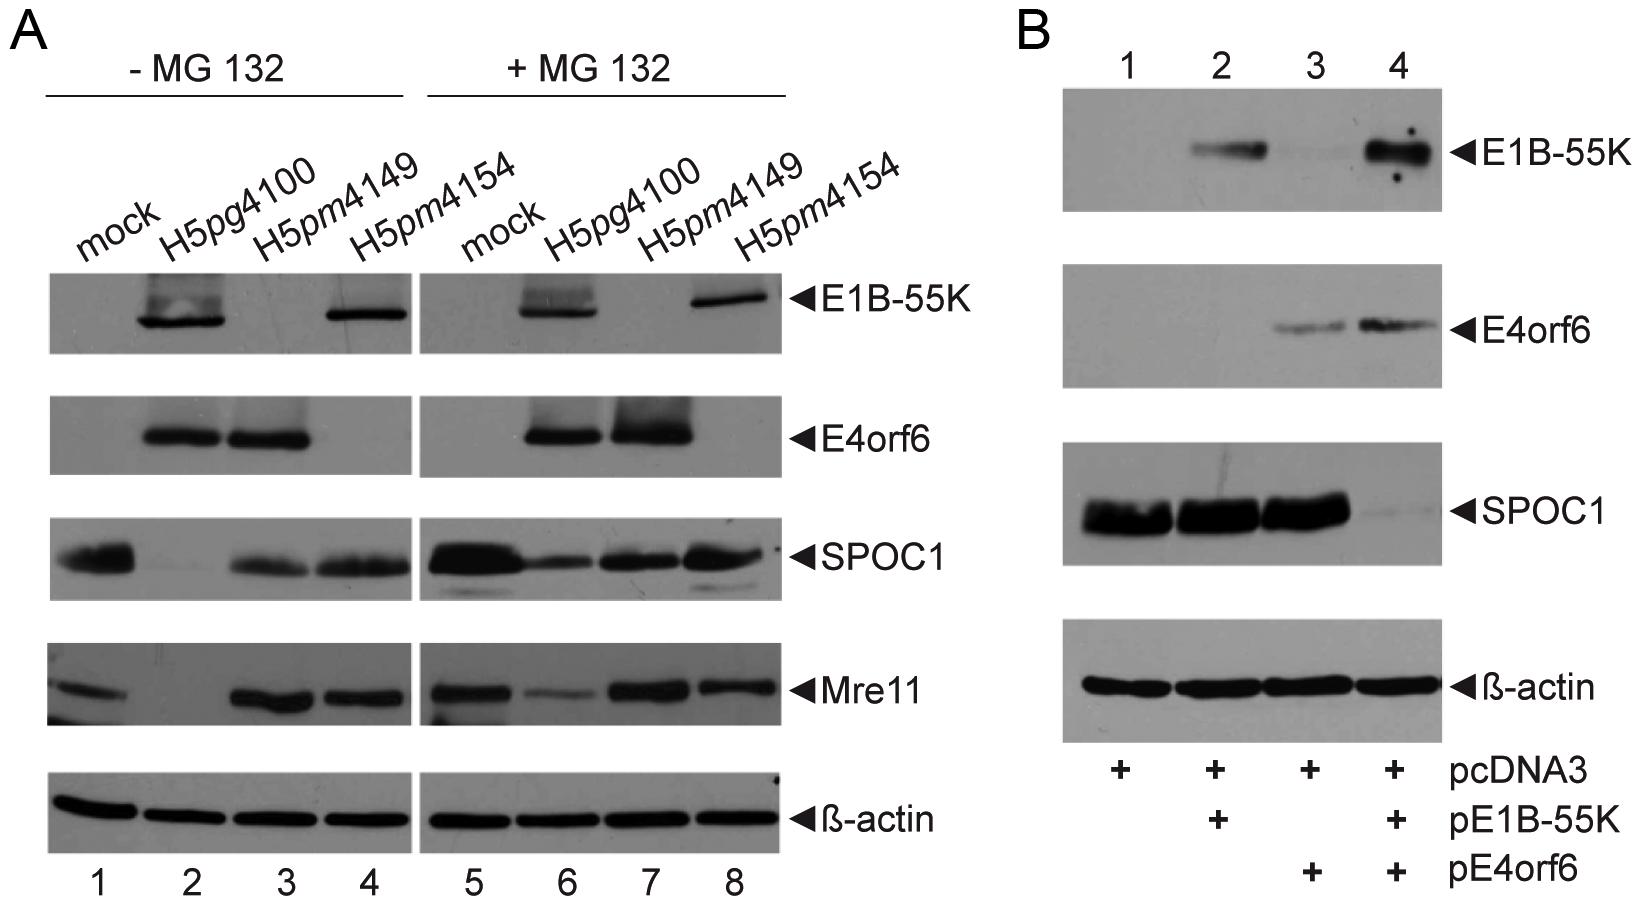 Proteasomal degradation of SPOC1 by the E1B-55K/E4orf6 E3 ubiquitin ligase complex.